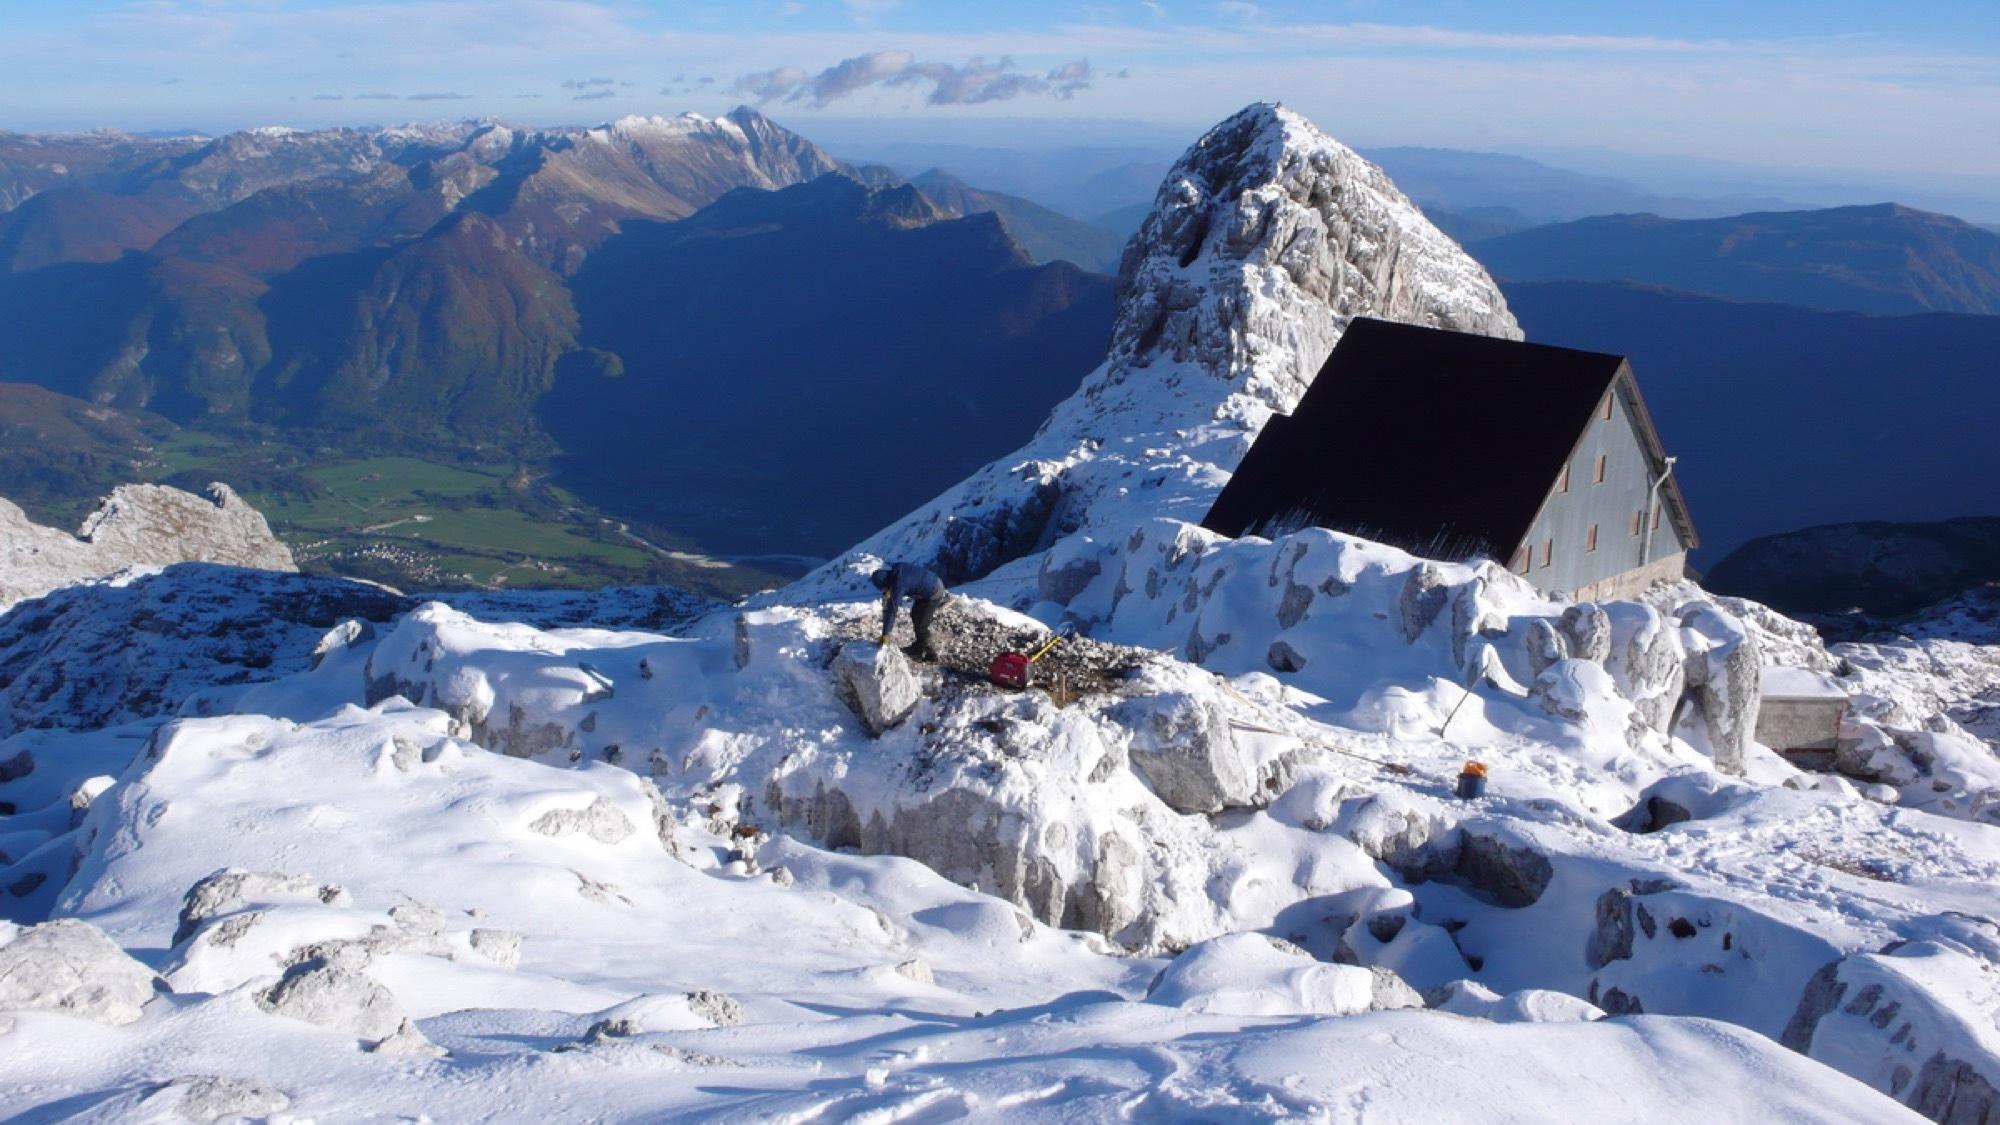 Galer a de caba a de invierno en mount kanin ofis arhitekti 25 - Cabana invierno ...